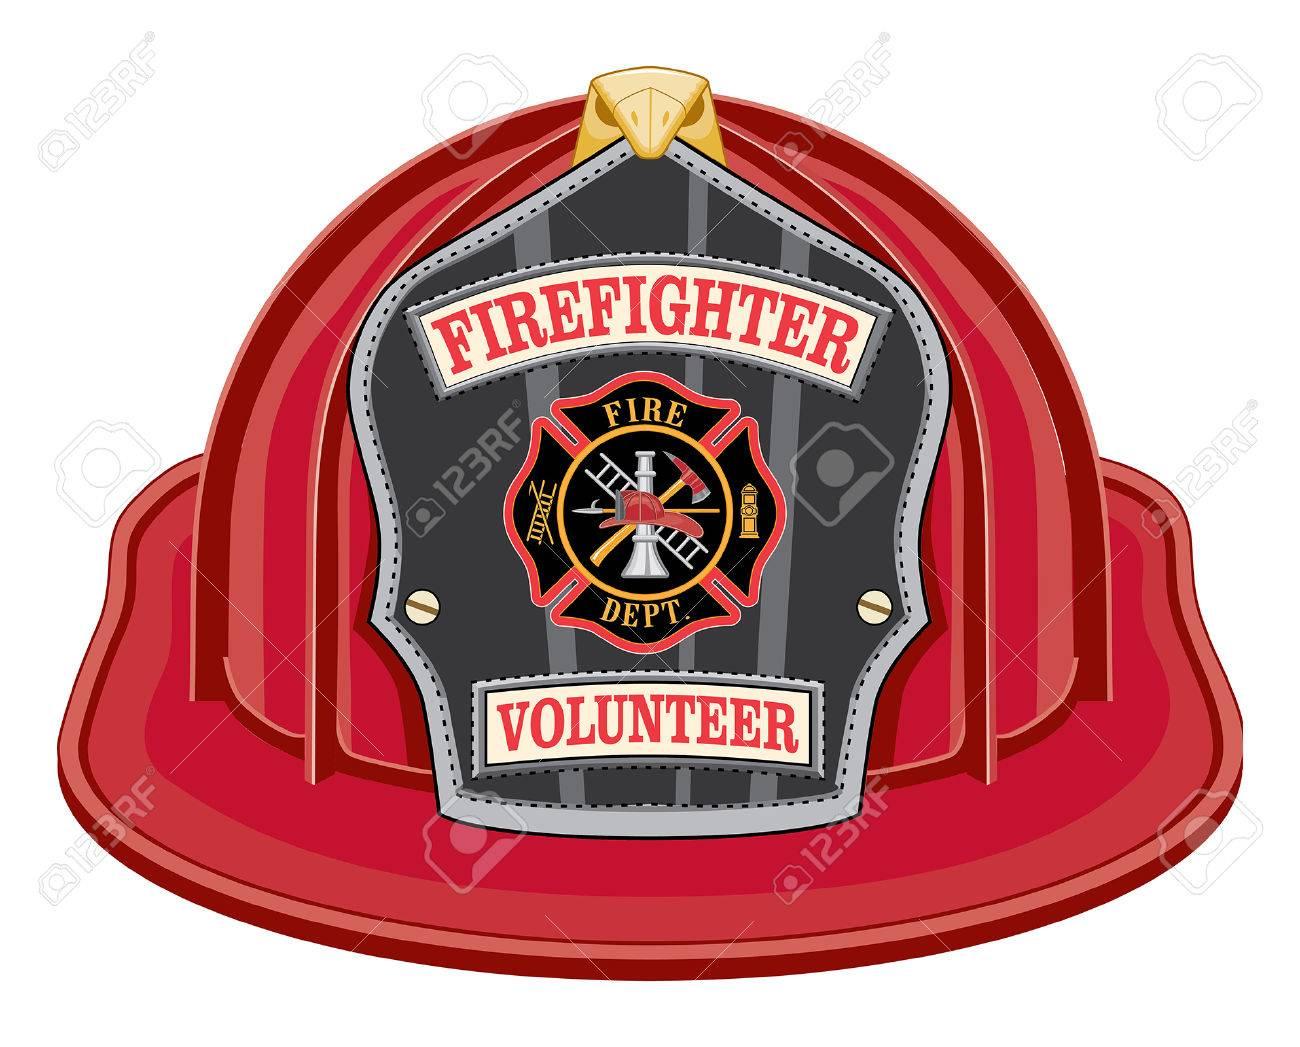 Bombero Voluntario Casco Rojo Es Una Ilustración De Un Casco De Bombero  Rojo O Sombrero De Bombero De Frente Con Un Escudo cf3b5edf3e8